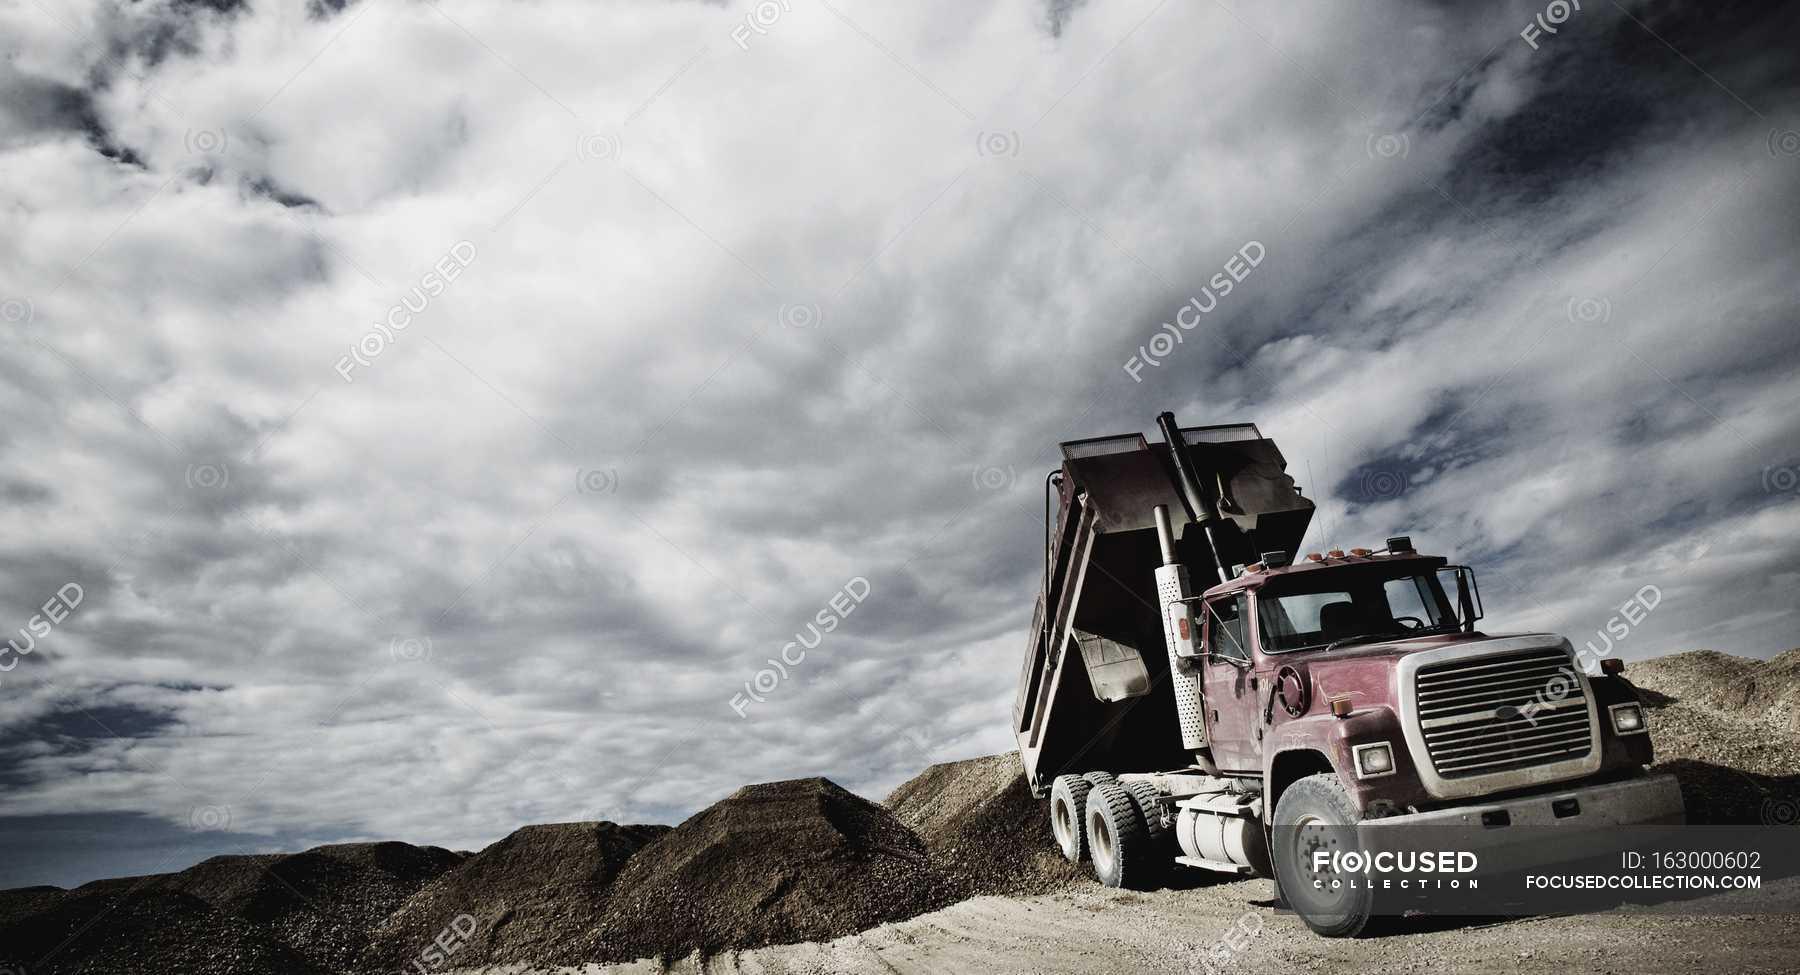 Dump Truck Unloading Stock Photo